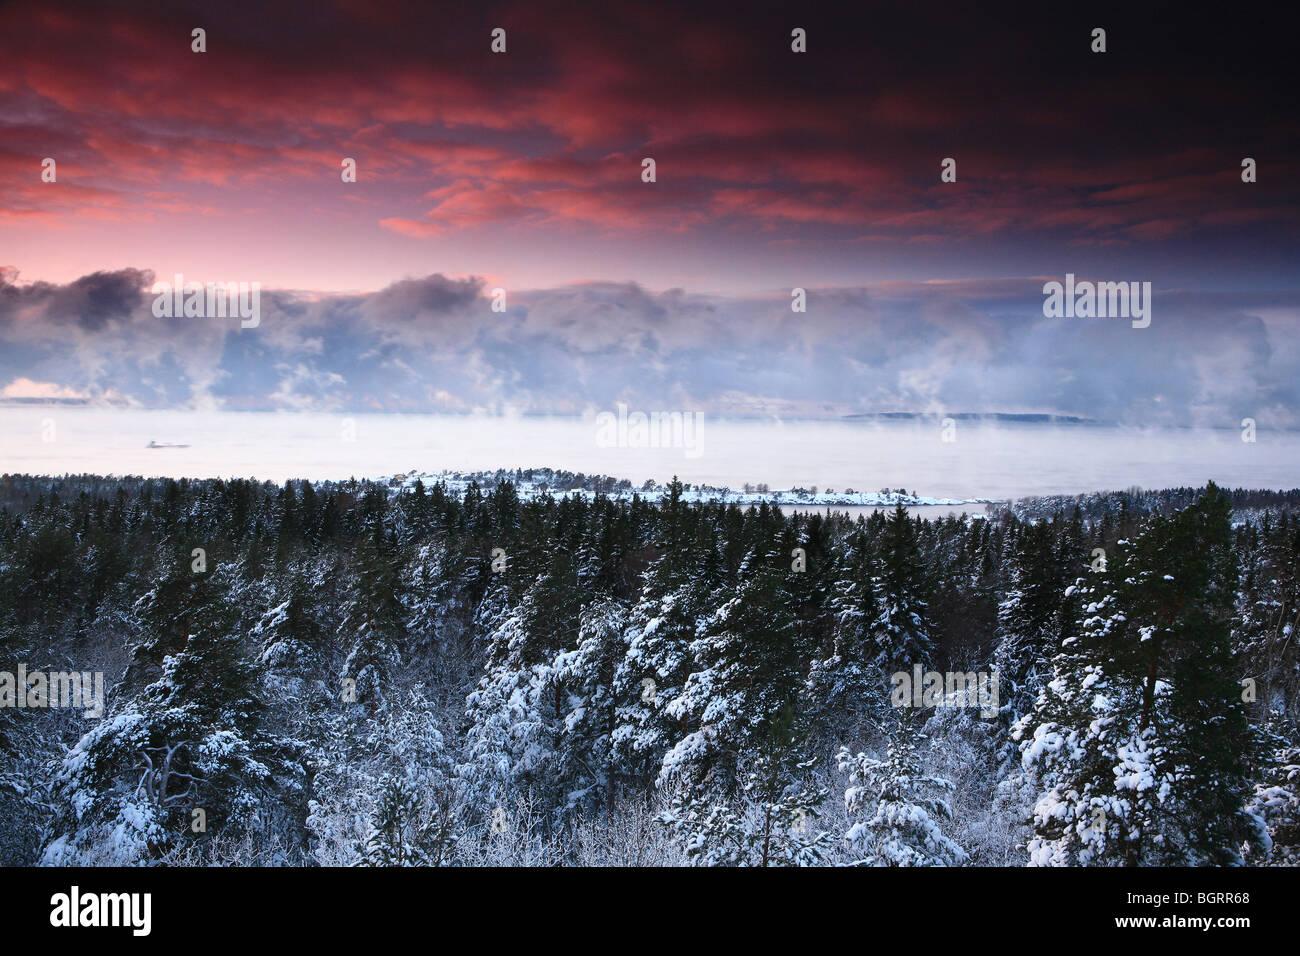 Paisaje invernal visto desde Vardåsen en Rygge kommune, Østfold fylke, Noruega. Imagen De Stock